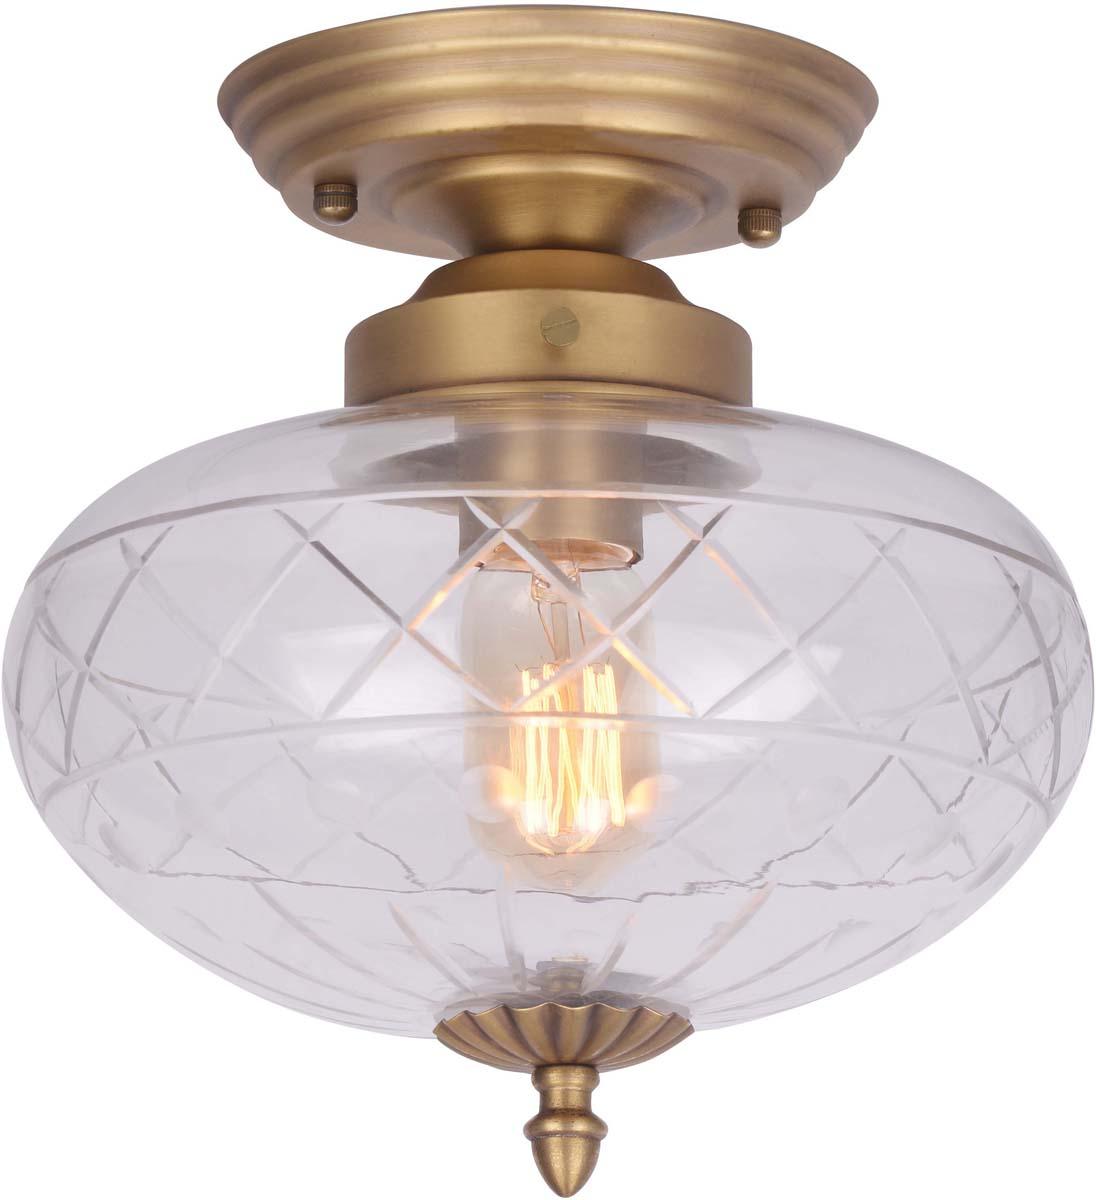 Светильник потолочный Arte Lamp Faberge, 1 х E27, 40 W. A2303PL-1SG светильник потолочный sonex blanketa gold 2 х e27 60w 102 k